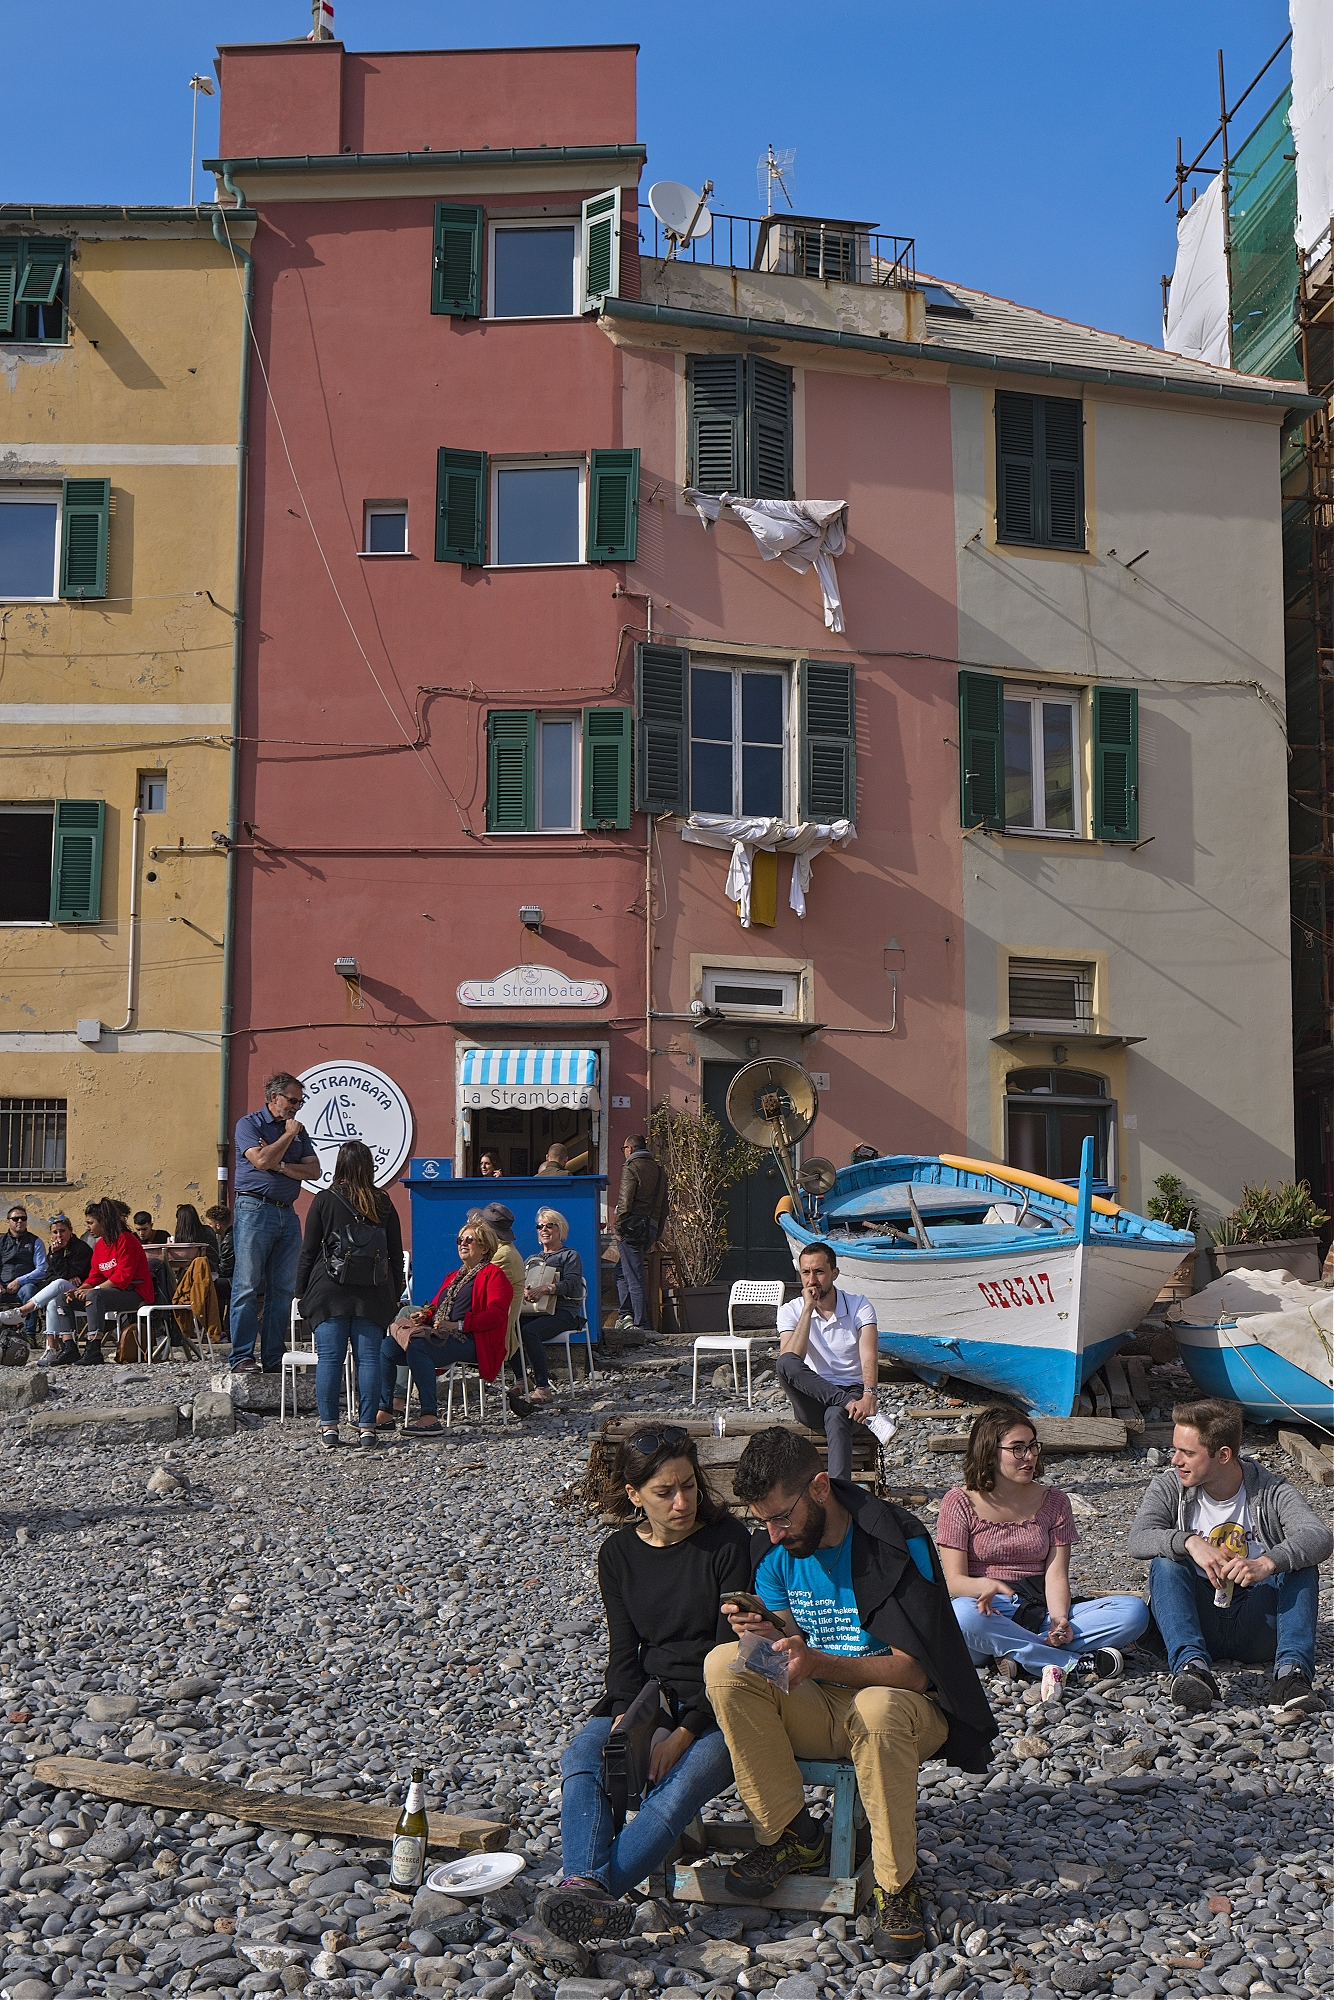 Bar La Strambatta, Genoa